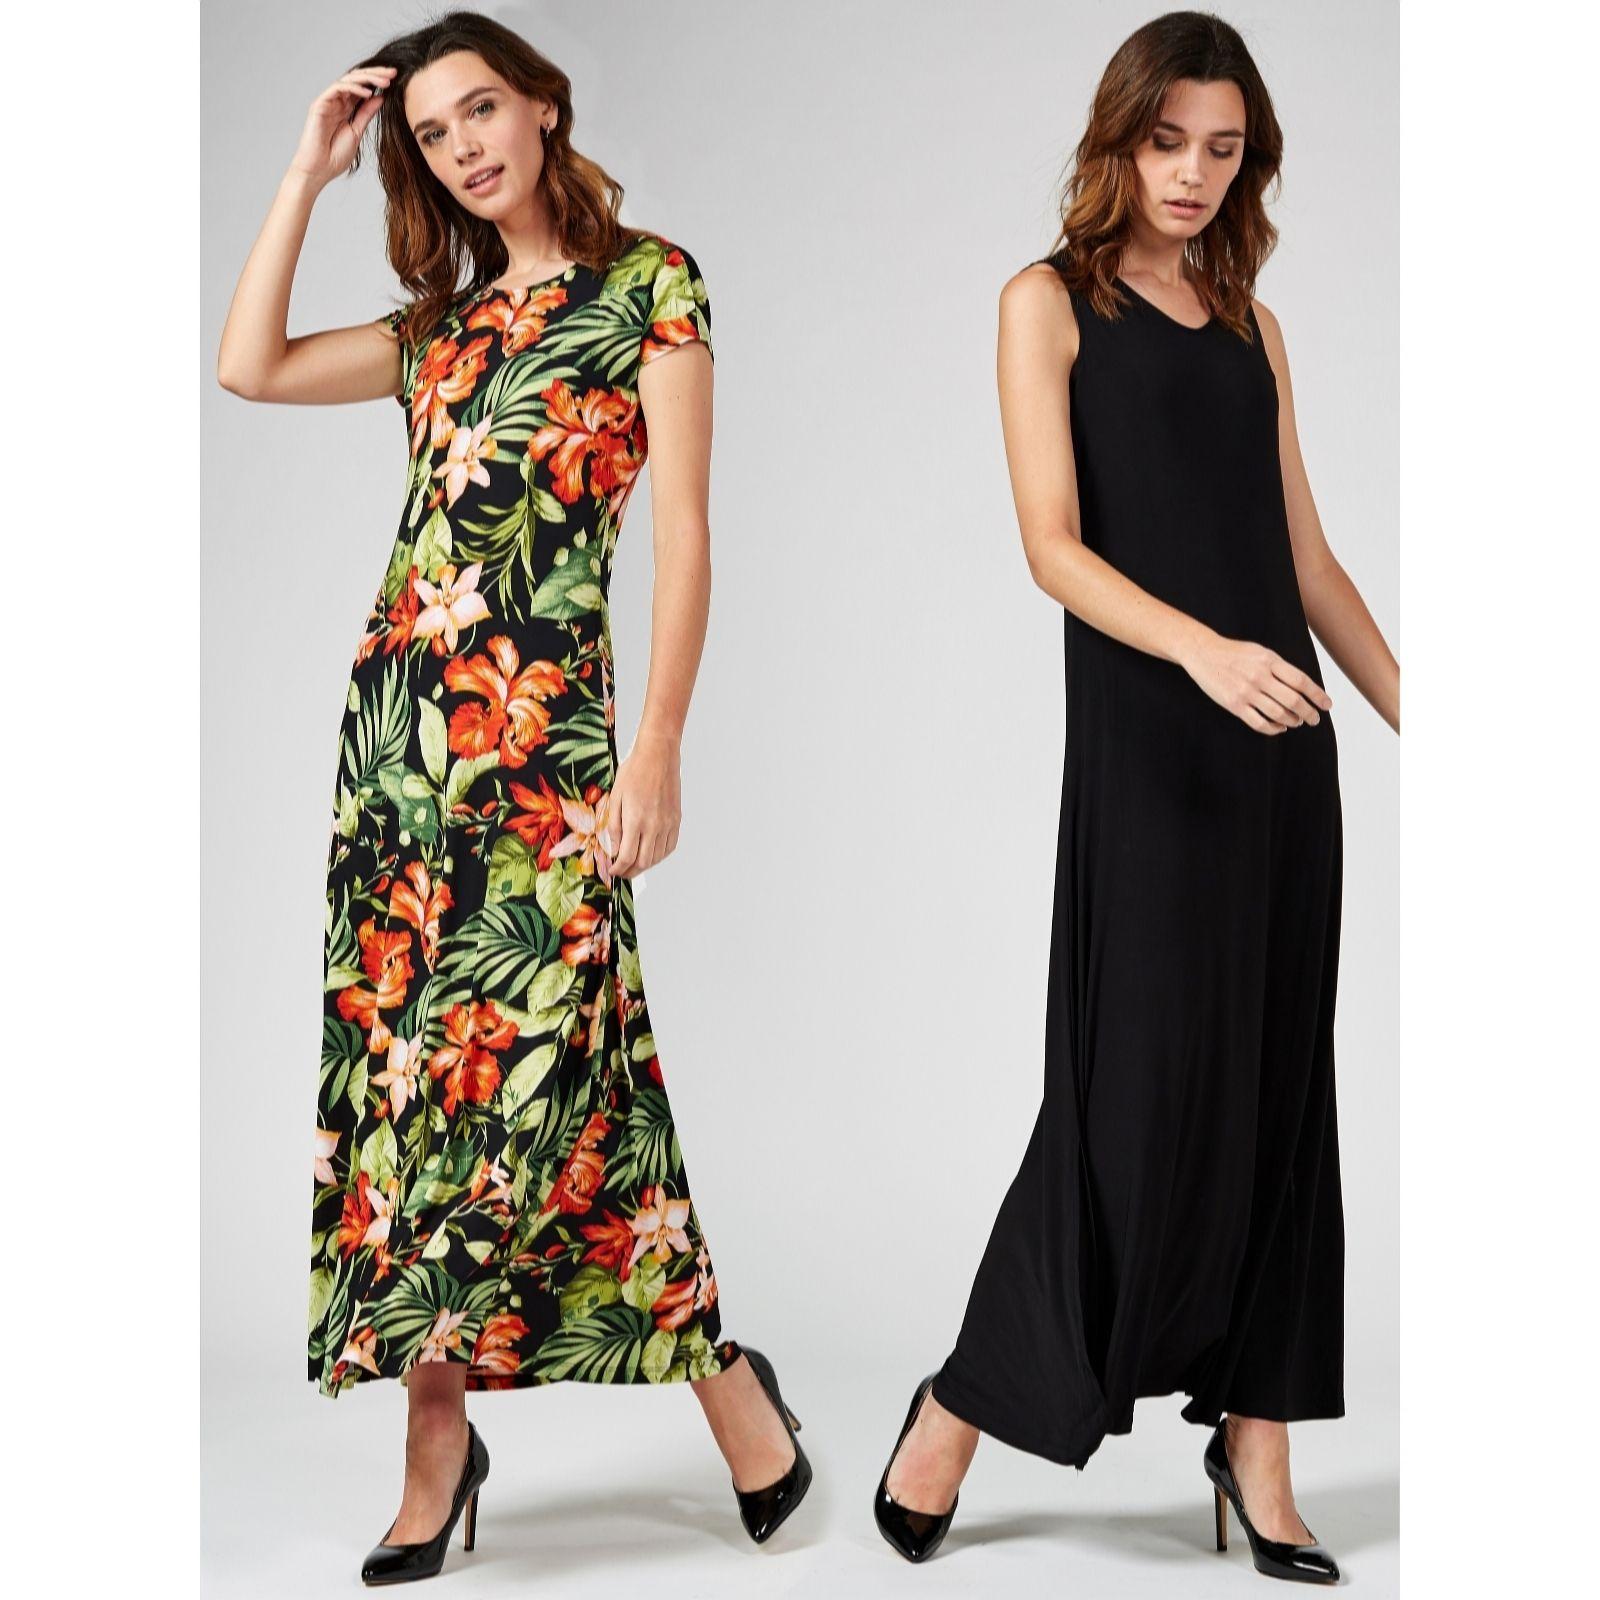 8d01311d6759 Attitudes by Renee Set of Two Print and Plain Maxi Dresses Petite ...